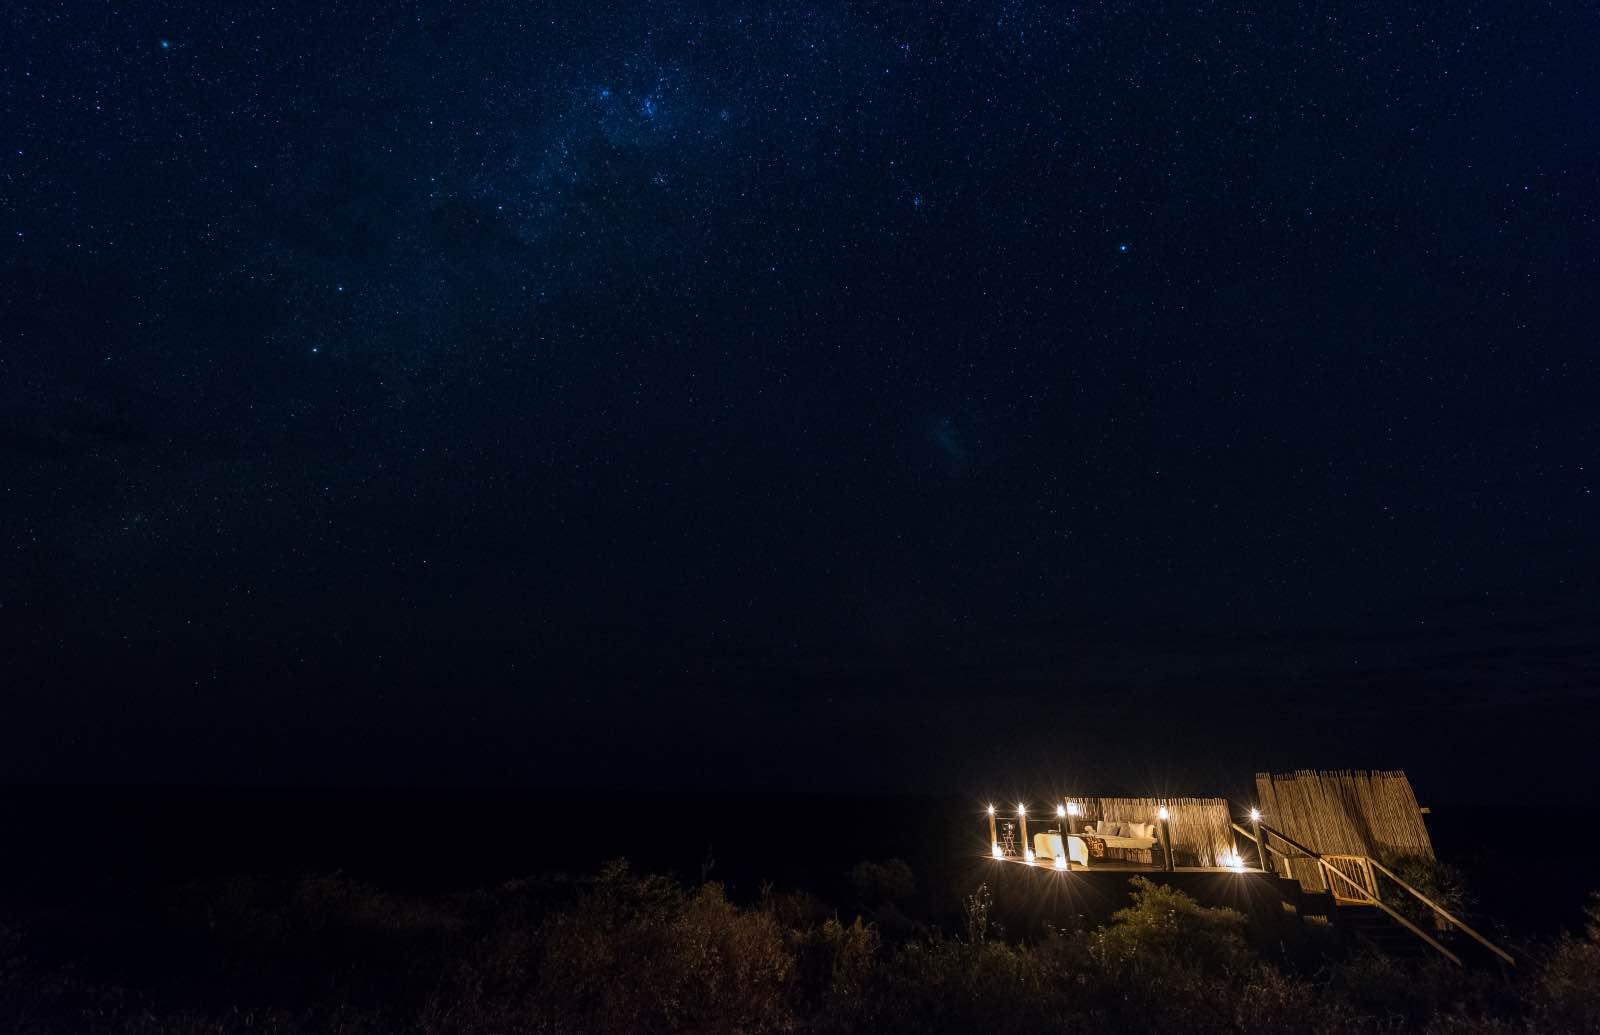 Stellar skies of the Kalahari seen above Tau Pan Camp